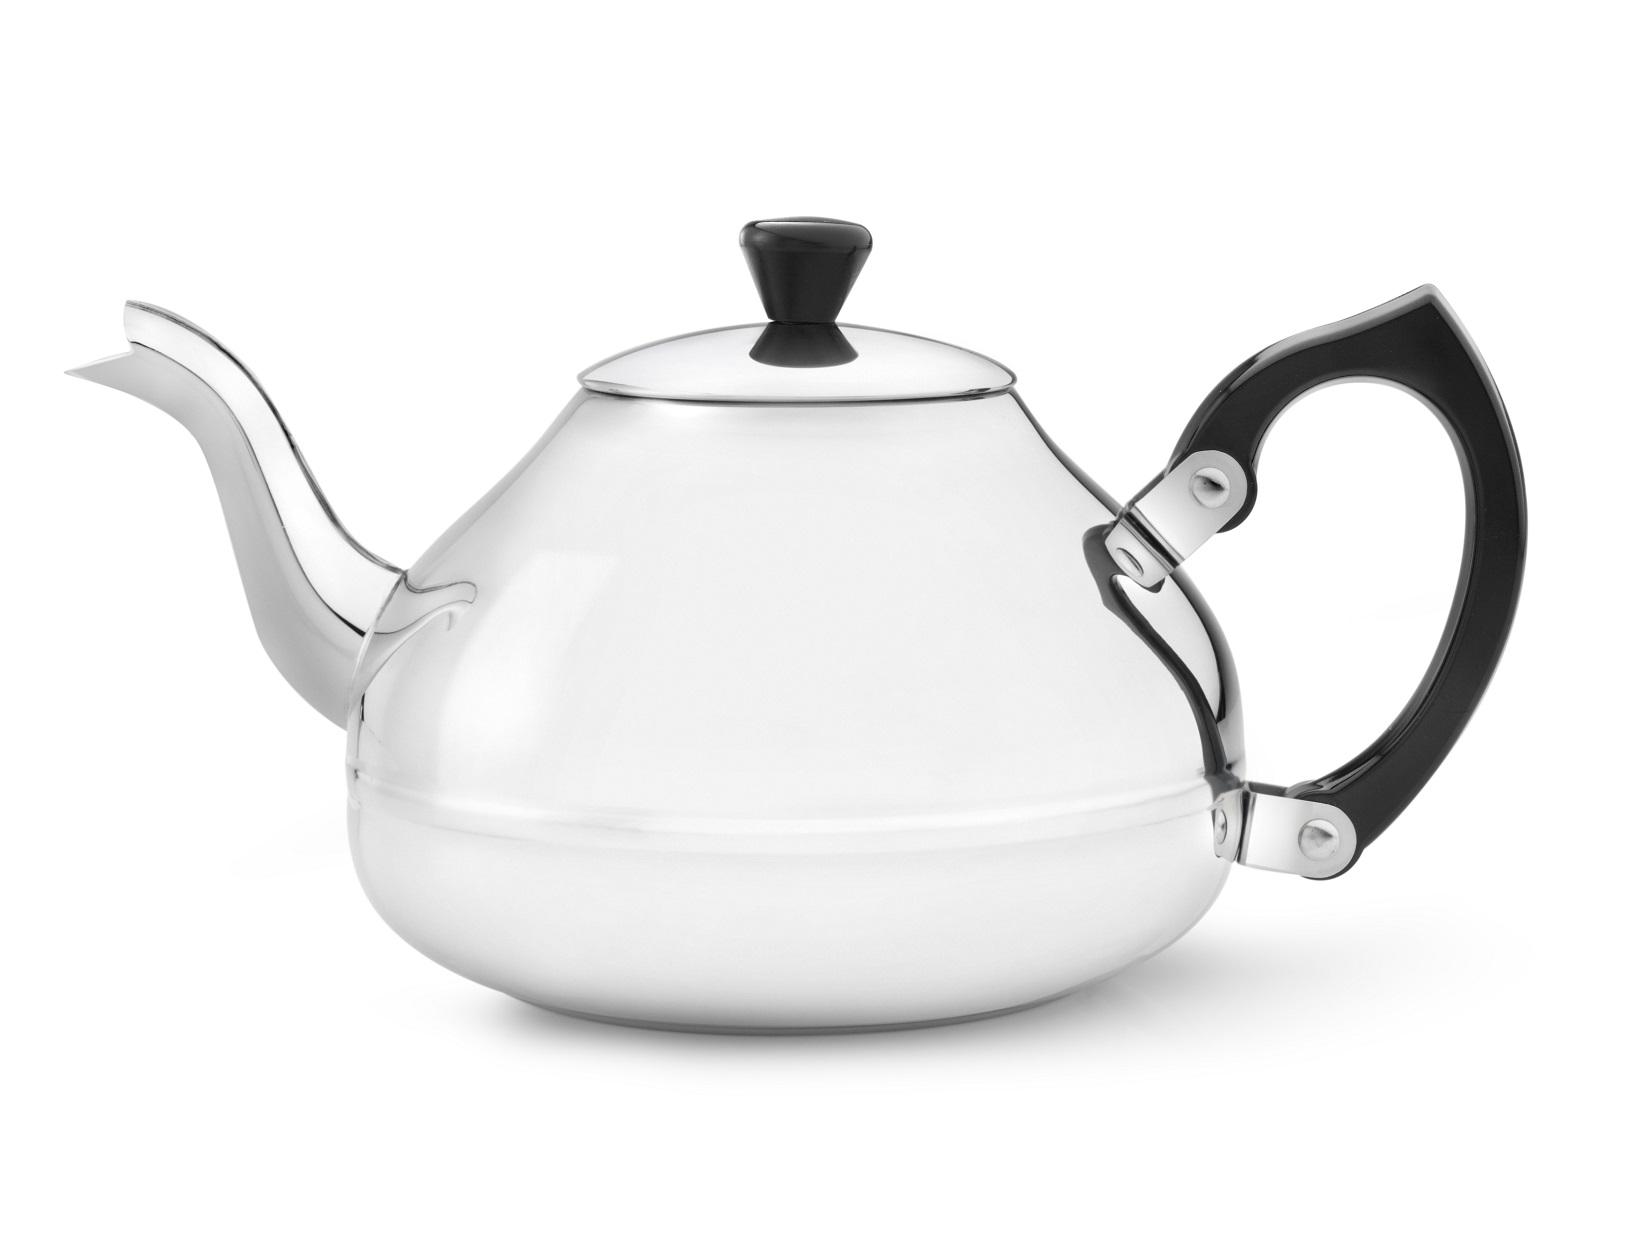 Teekanne Ceylon Bredemeijer 1,2L.